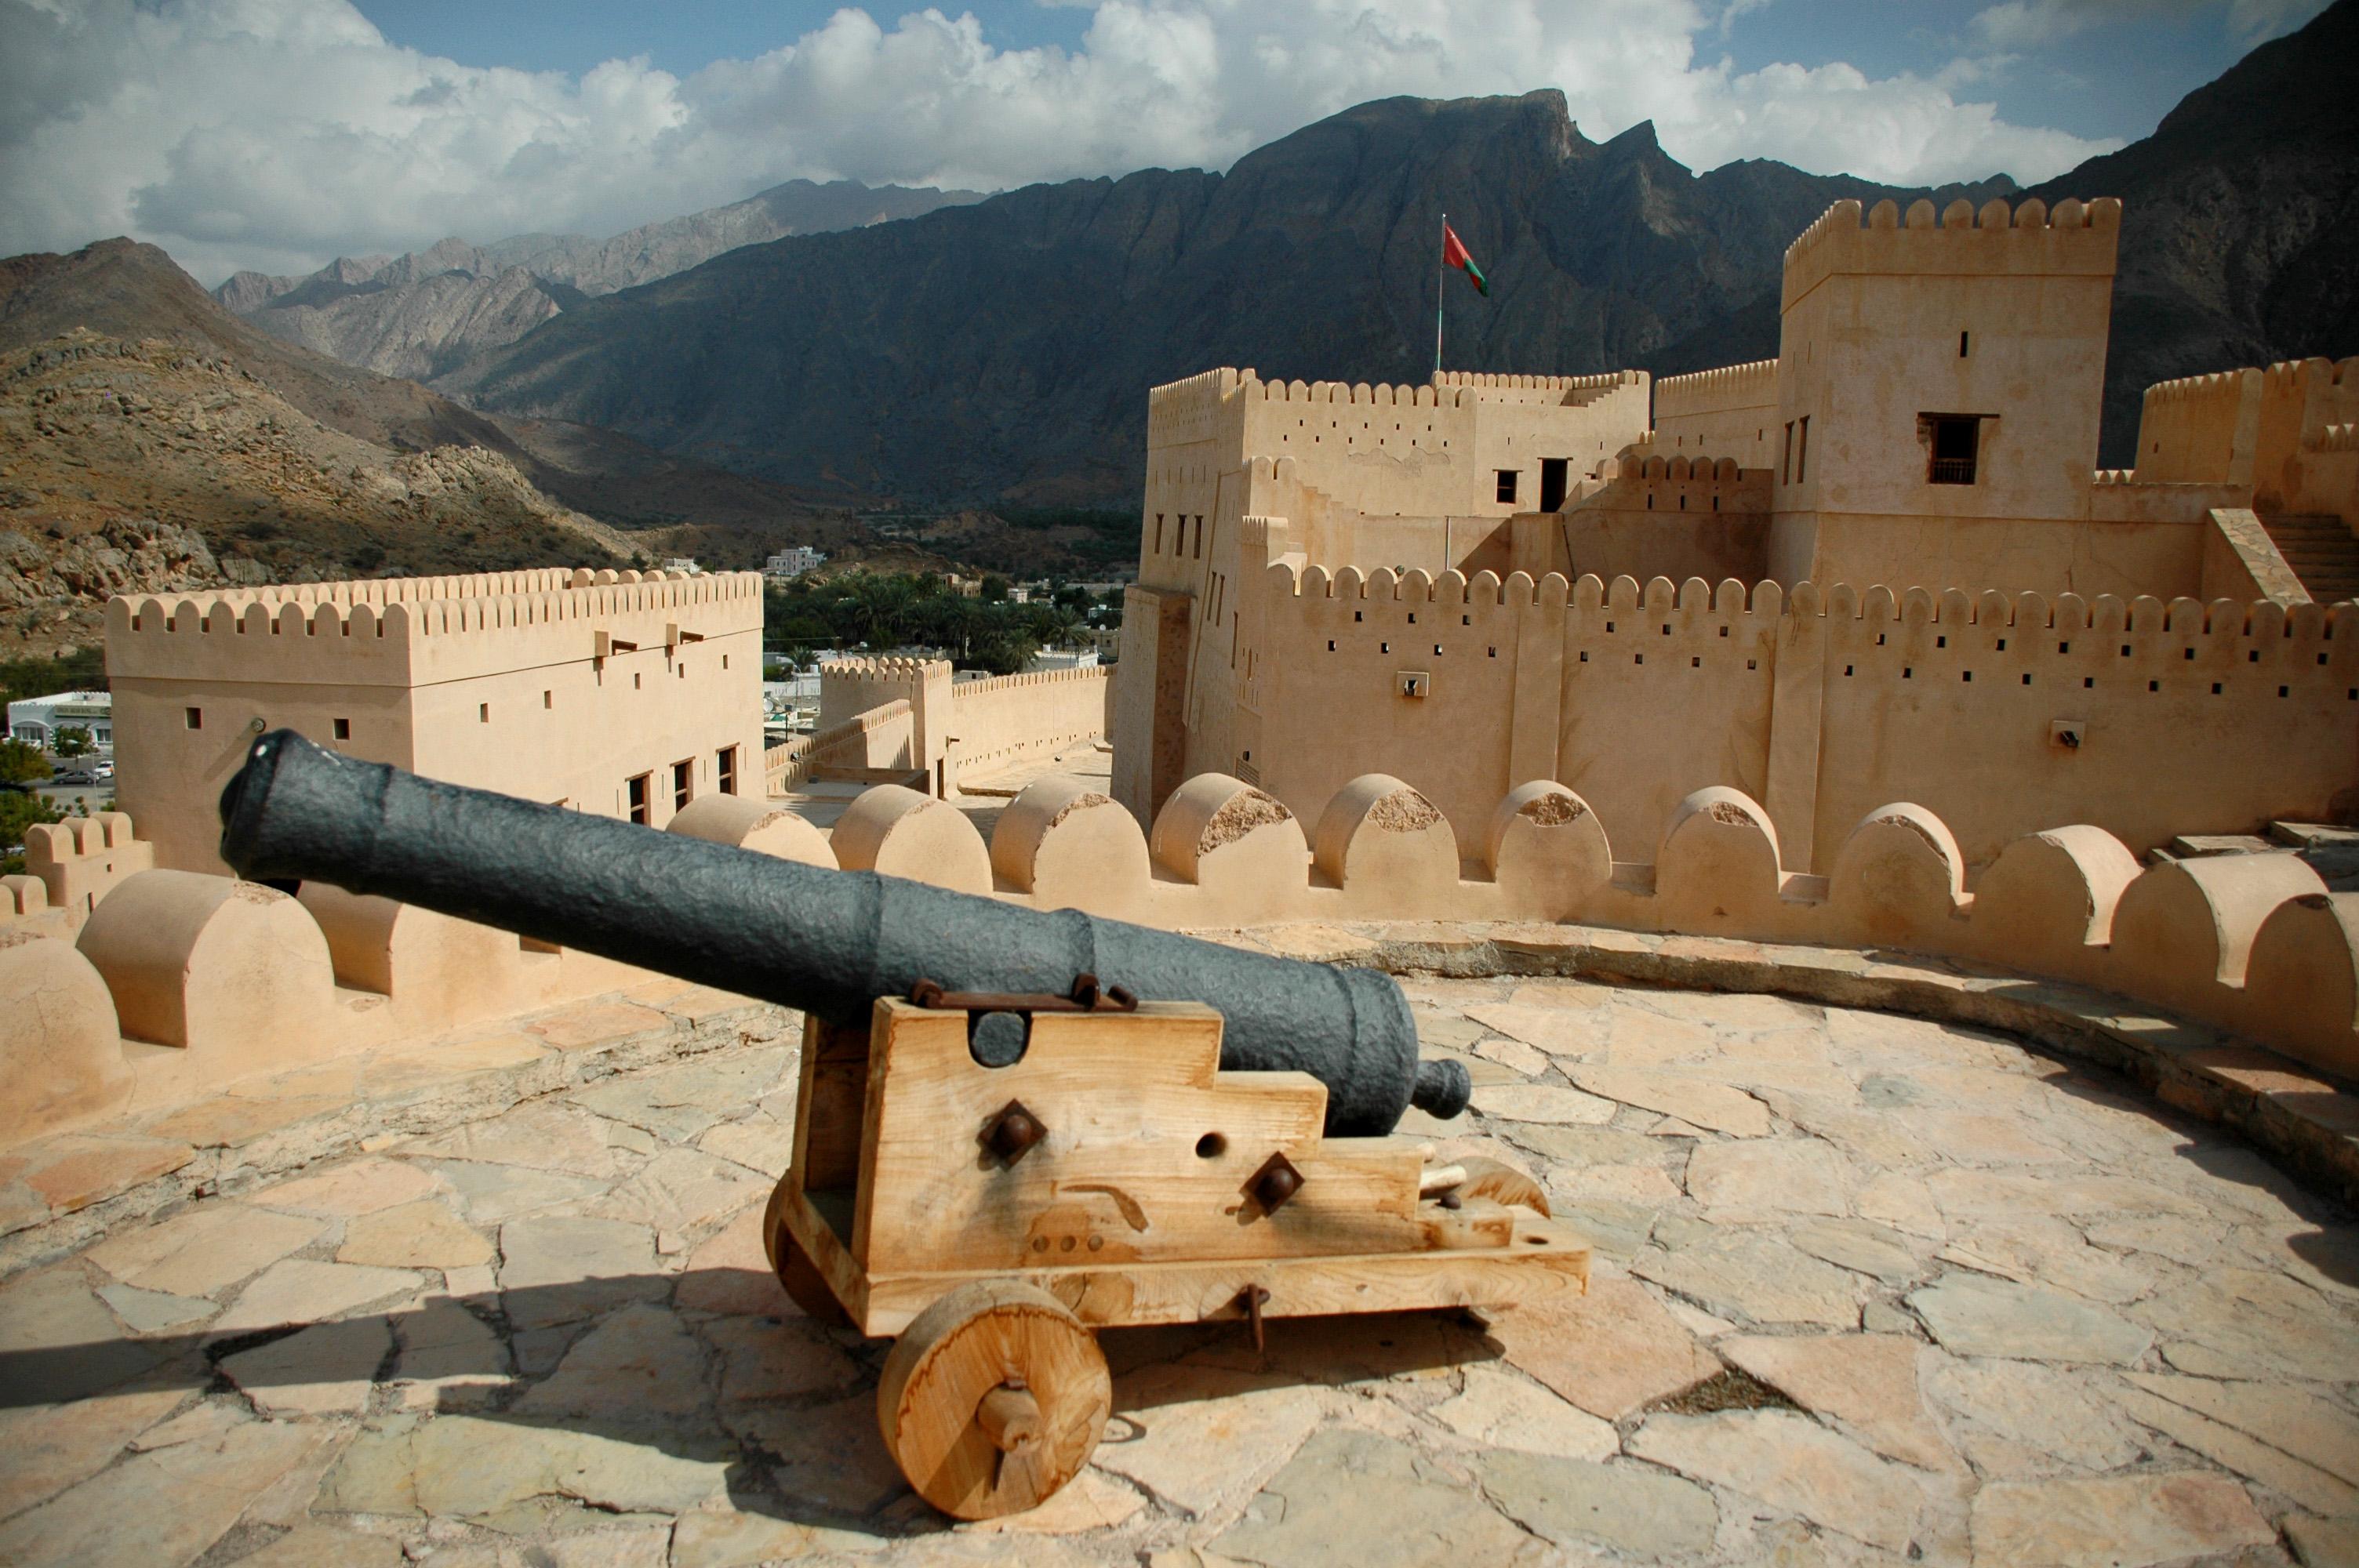 Oman Fort Ramparts © jonovernon-powell.com